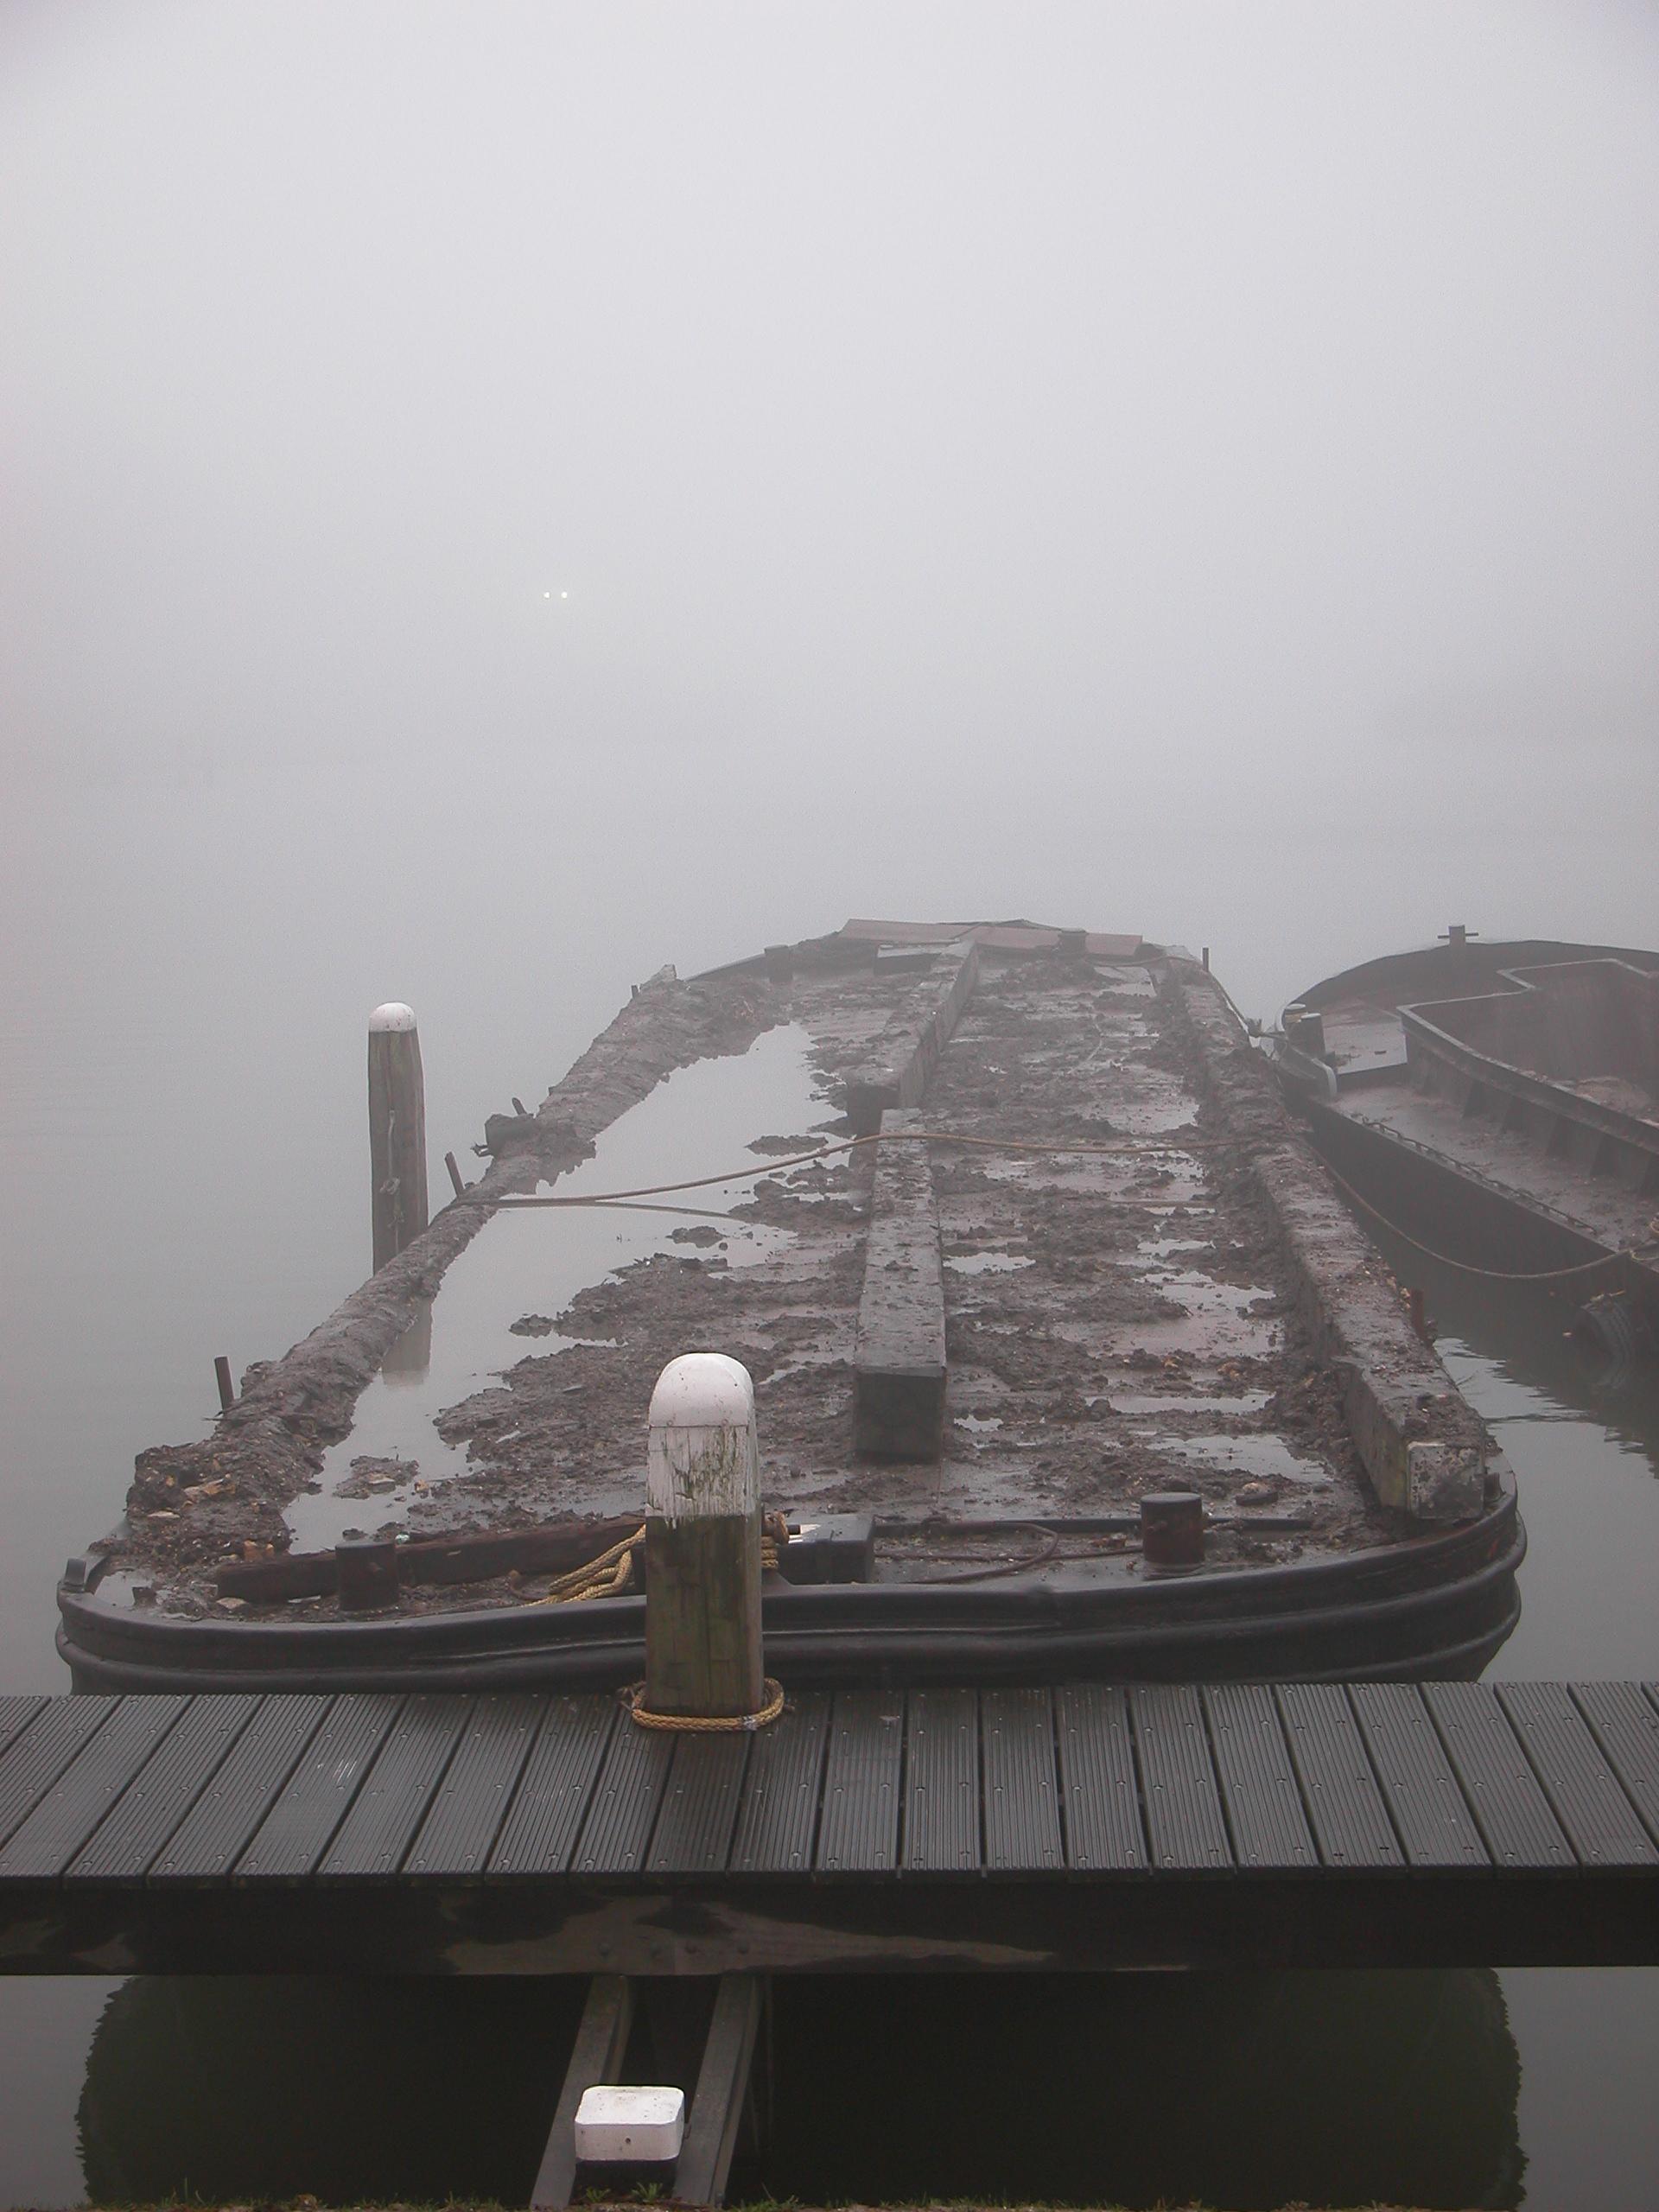 vehicles water warf quay barge mist fog royalty-free